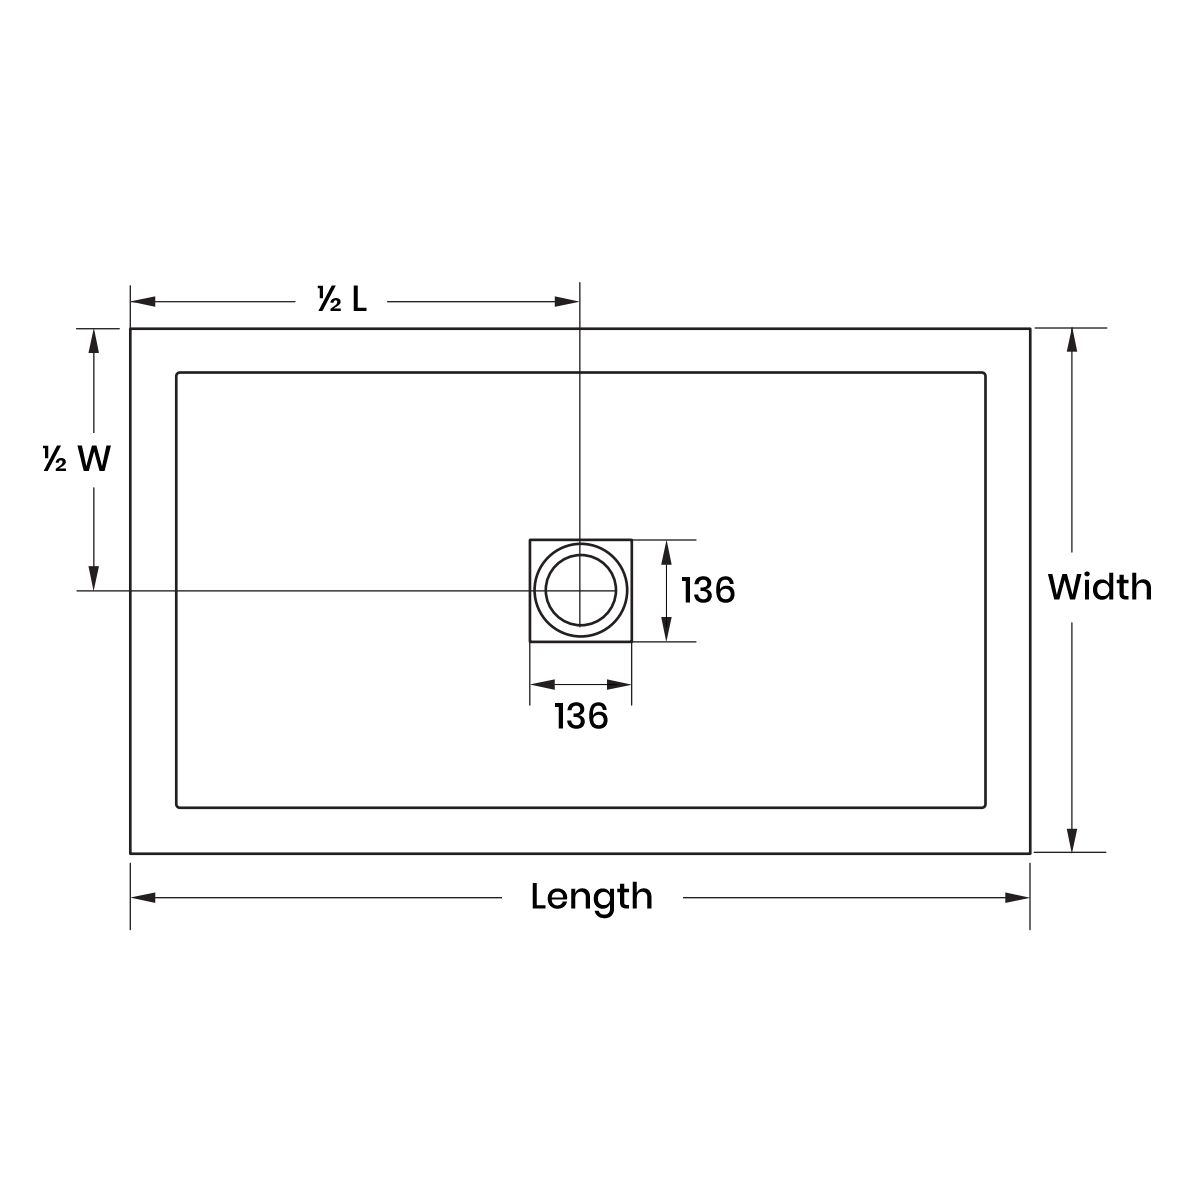 Aquadart Black Slate Shower Tray 1200 x 760 Dimension